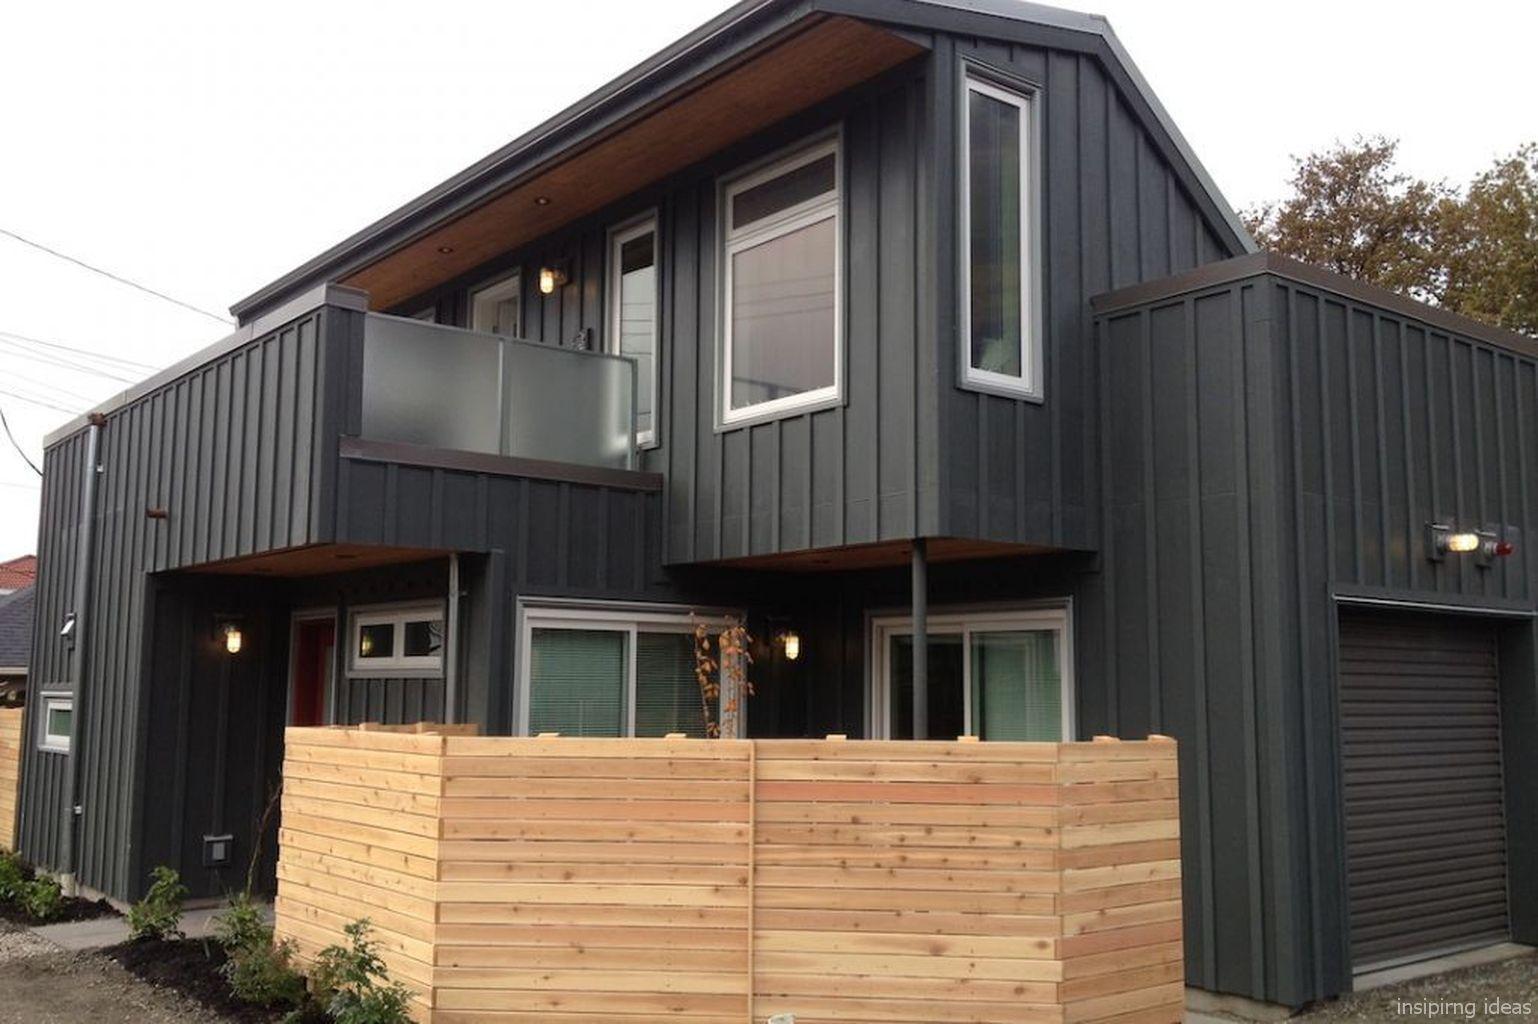 Room A Holic All Inspiring Ideas Are Here Modern Farmhouse Exterior Wood Siding Exterior House Exterior